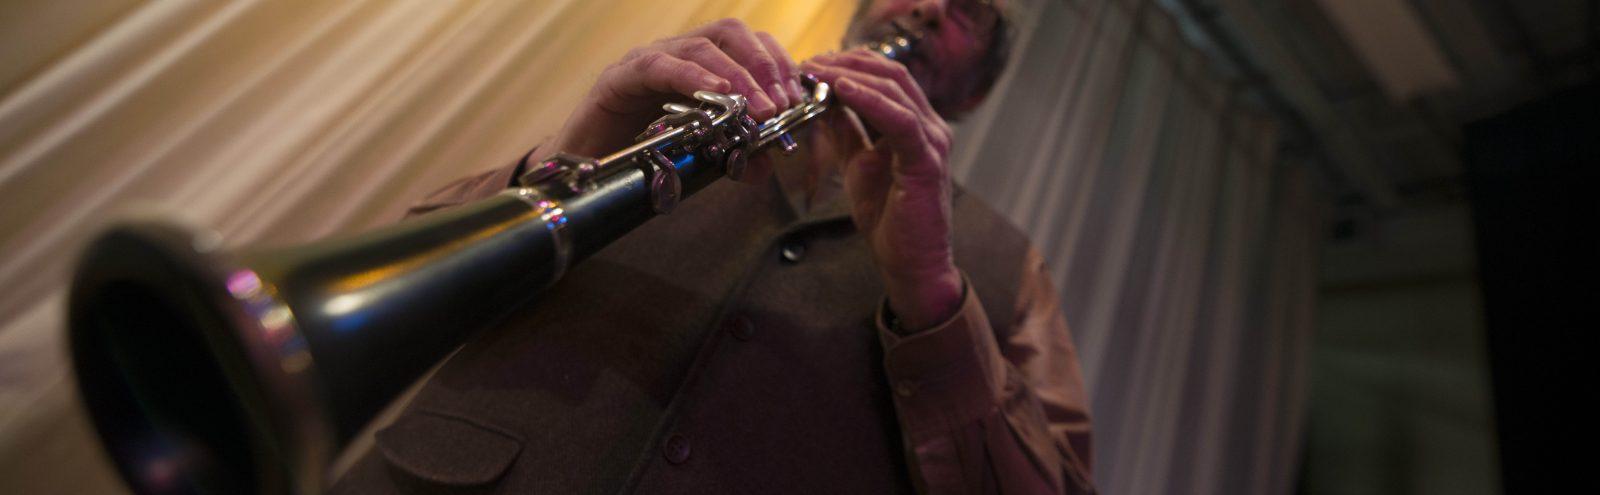 Northland College Professor Joel Glickman plays clarinet